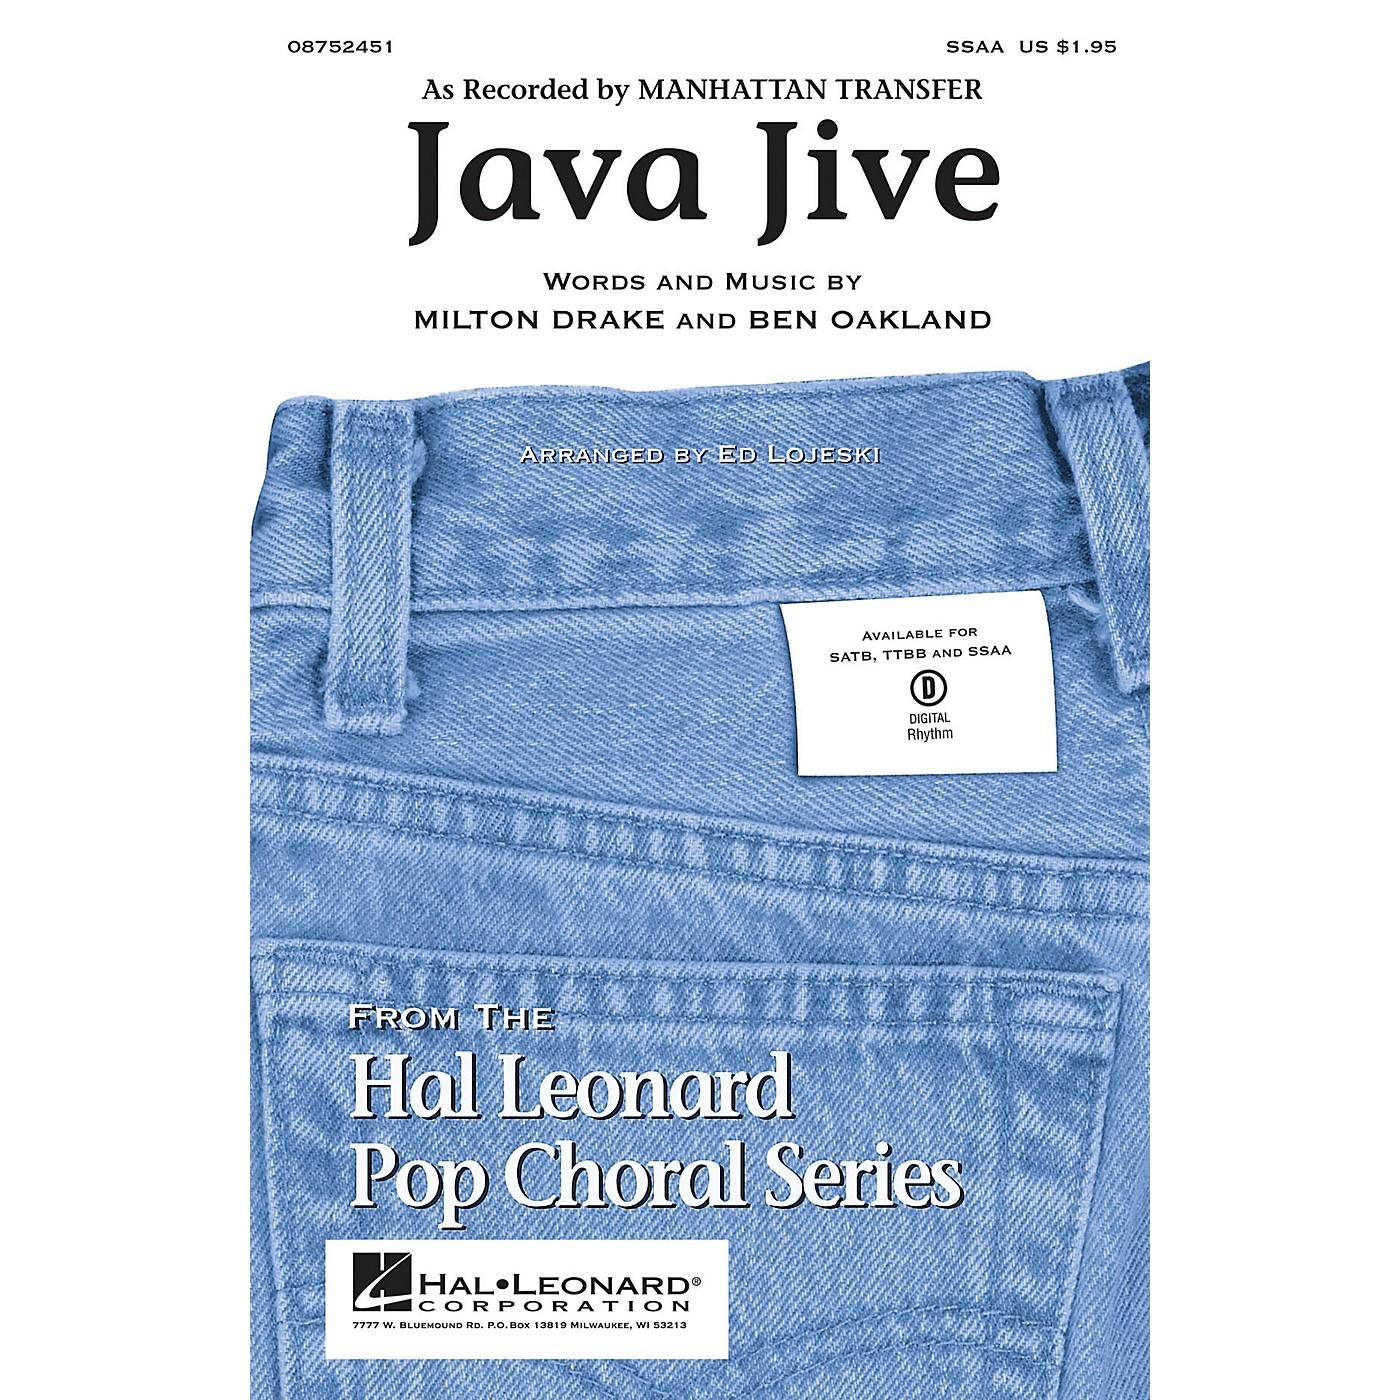 Hal Leonard Java Jive SSAA by Manhattan Transfer arranged by Ed Lojeski thumbnail